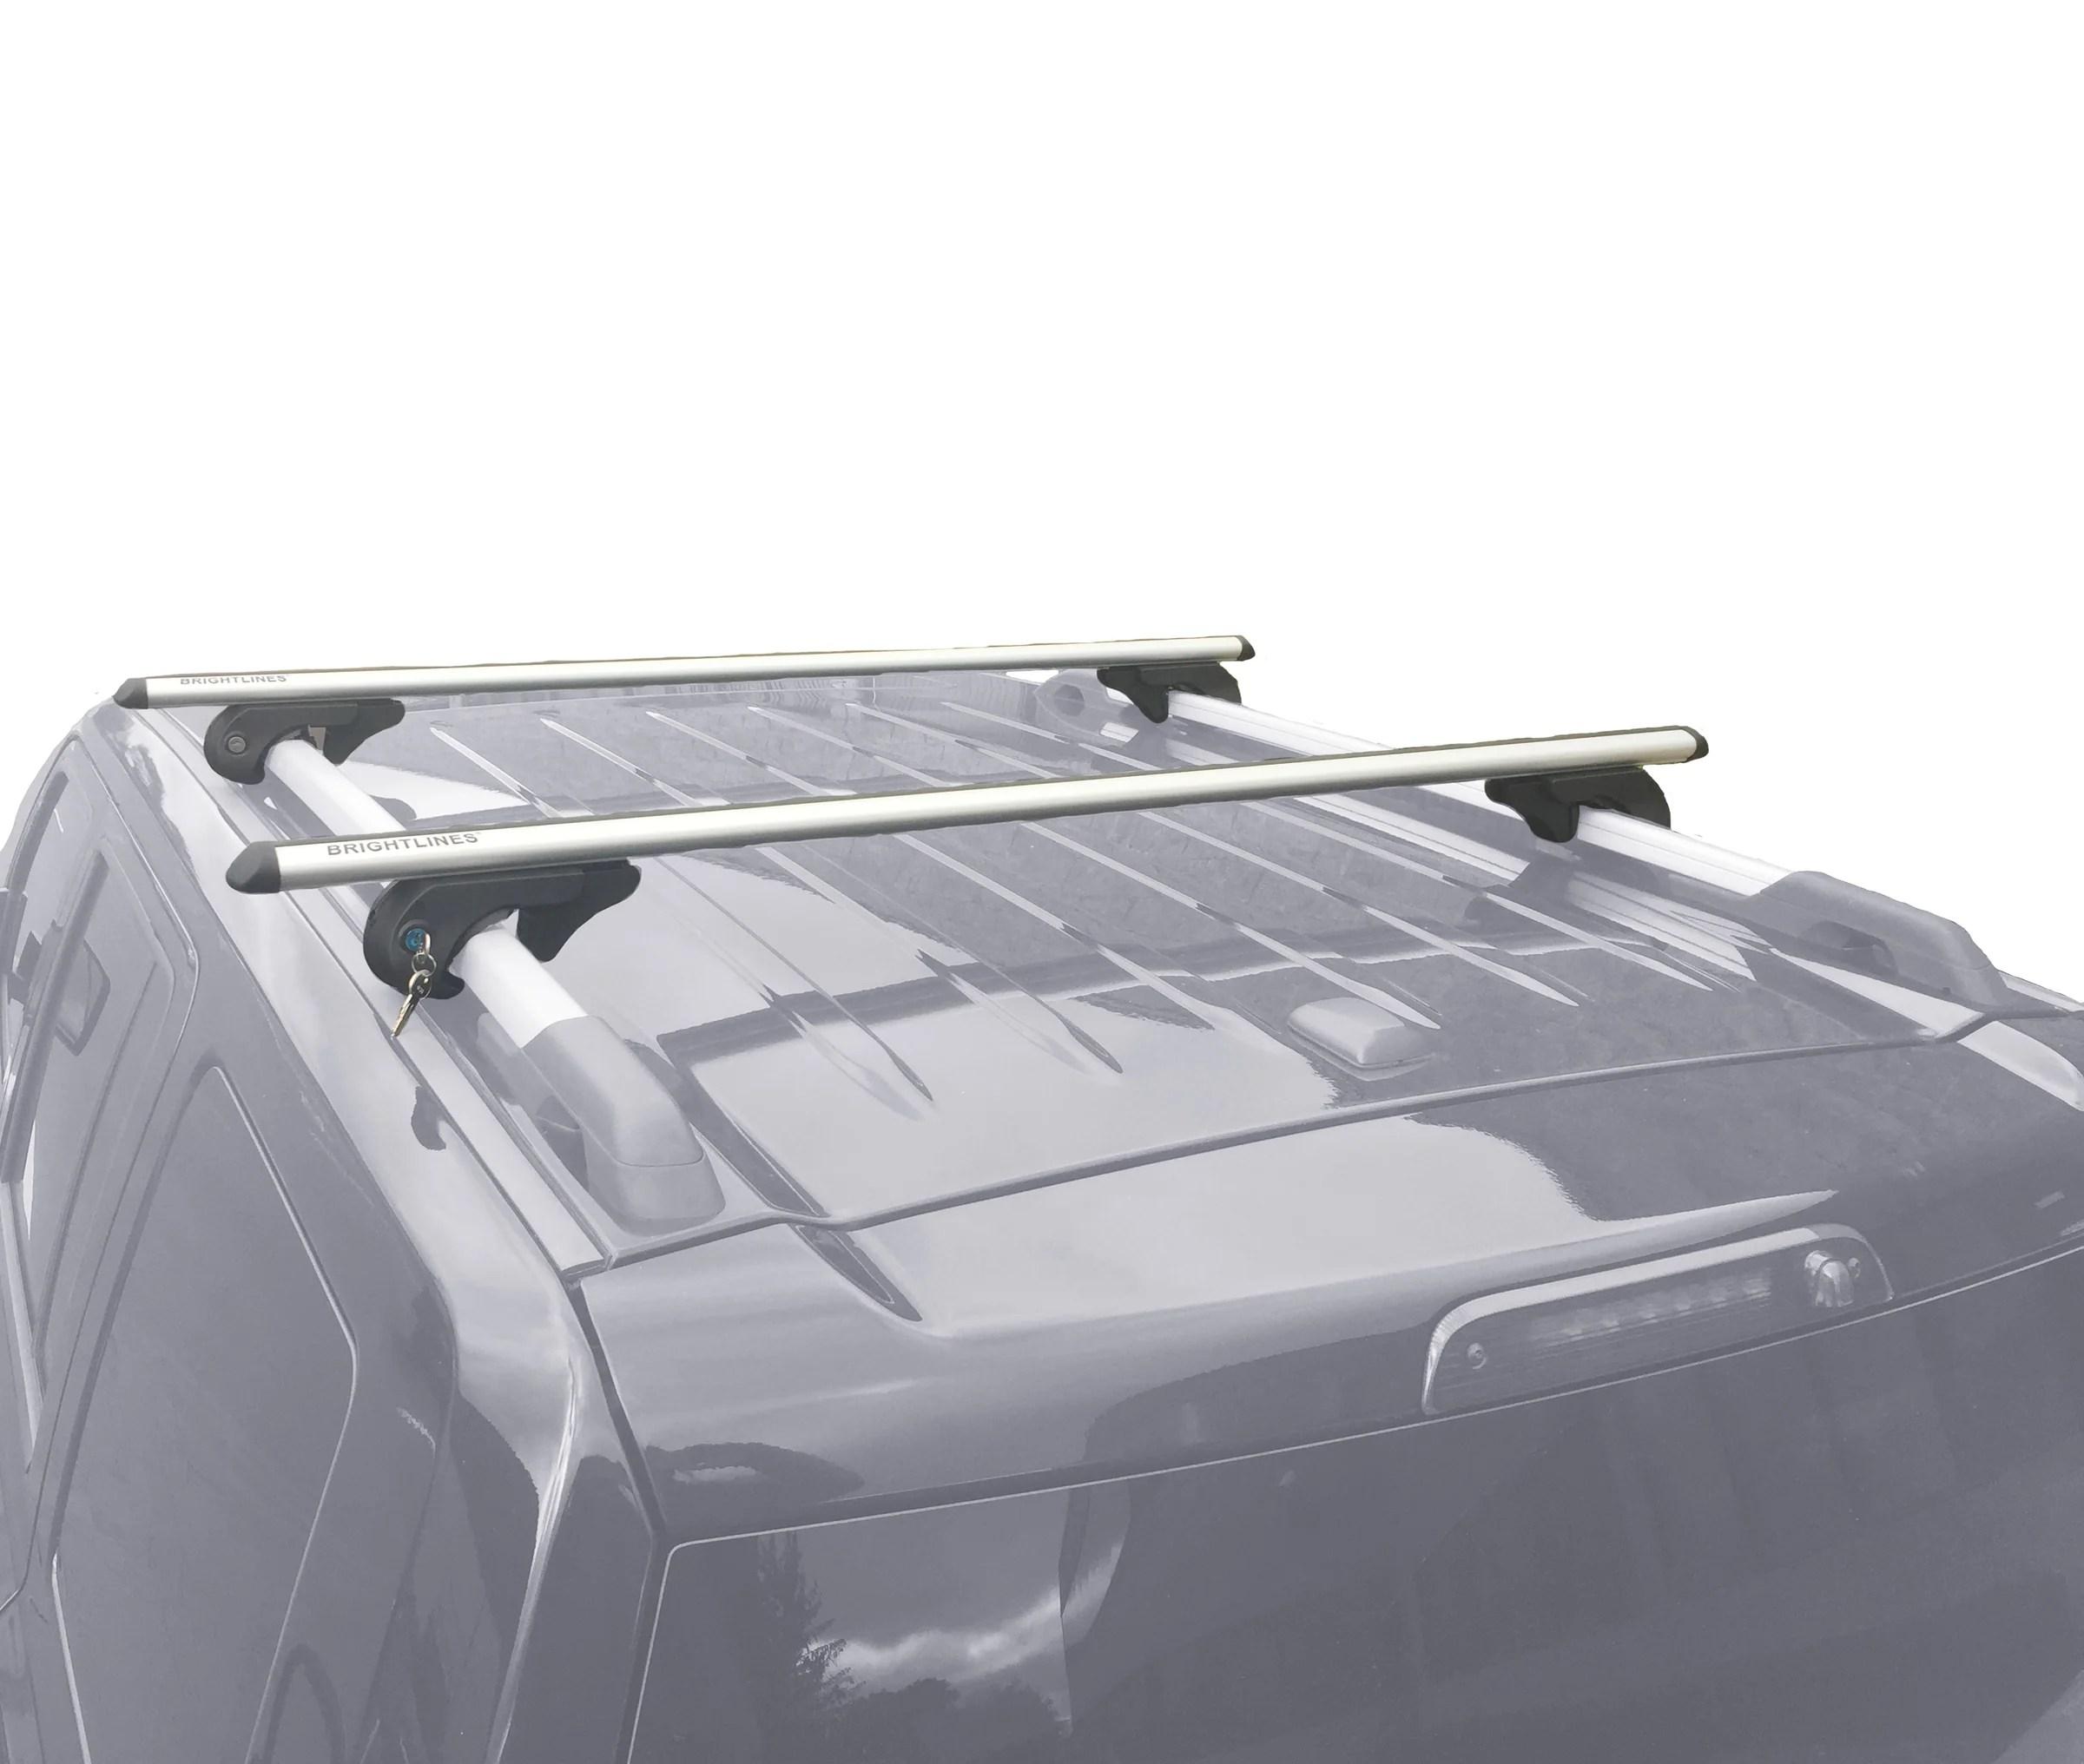 medium resolution of brightlines hyundai tucson roof rack crossbars 2004 2015 asg auto sports